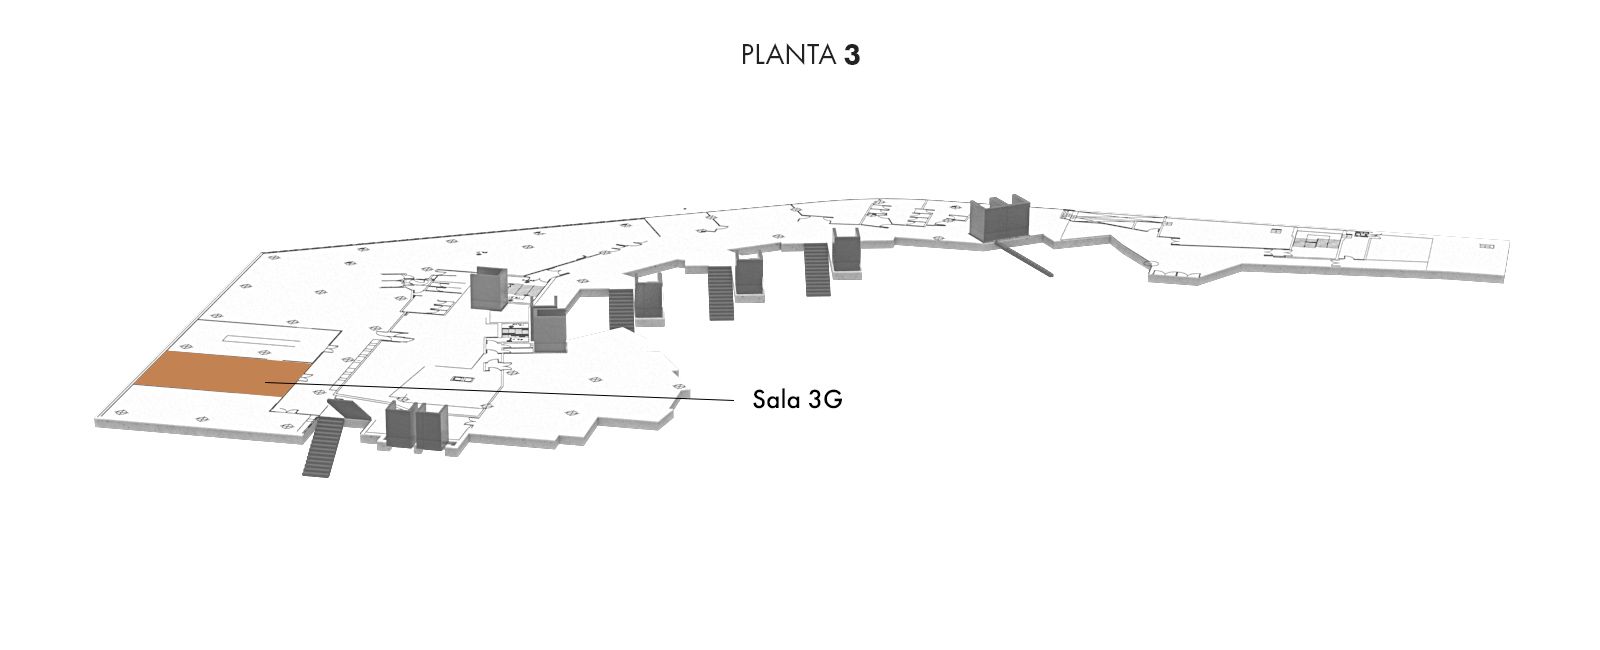 Sala 3G, Planta 3   Palacio Euskalduna Jauregia